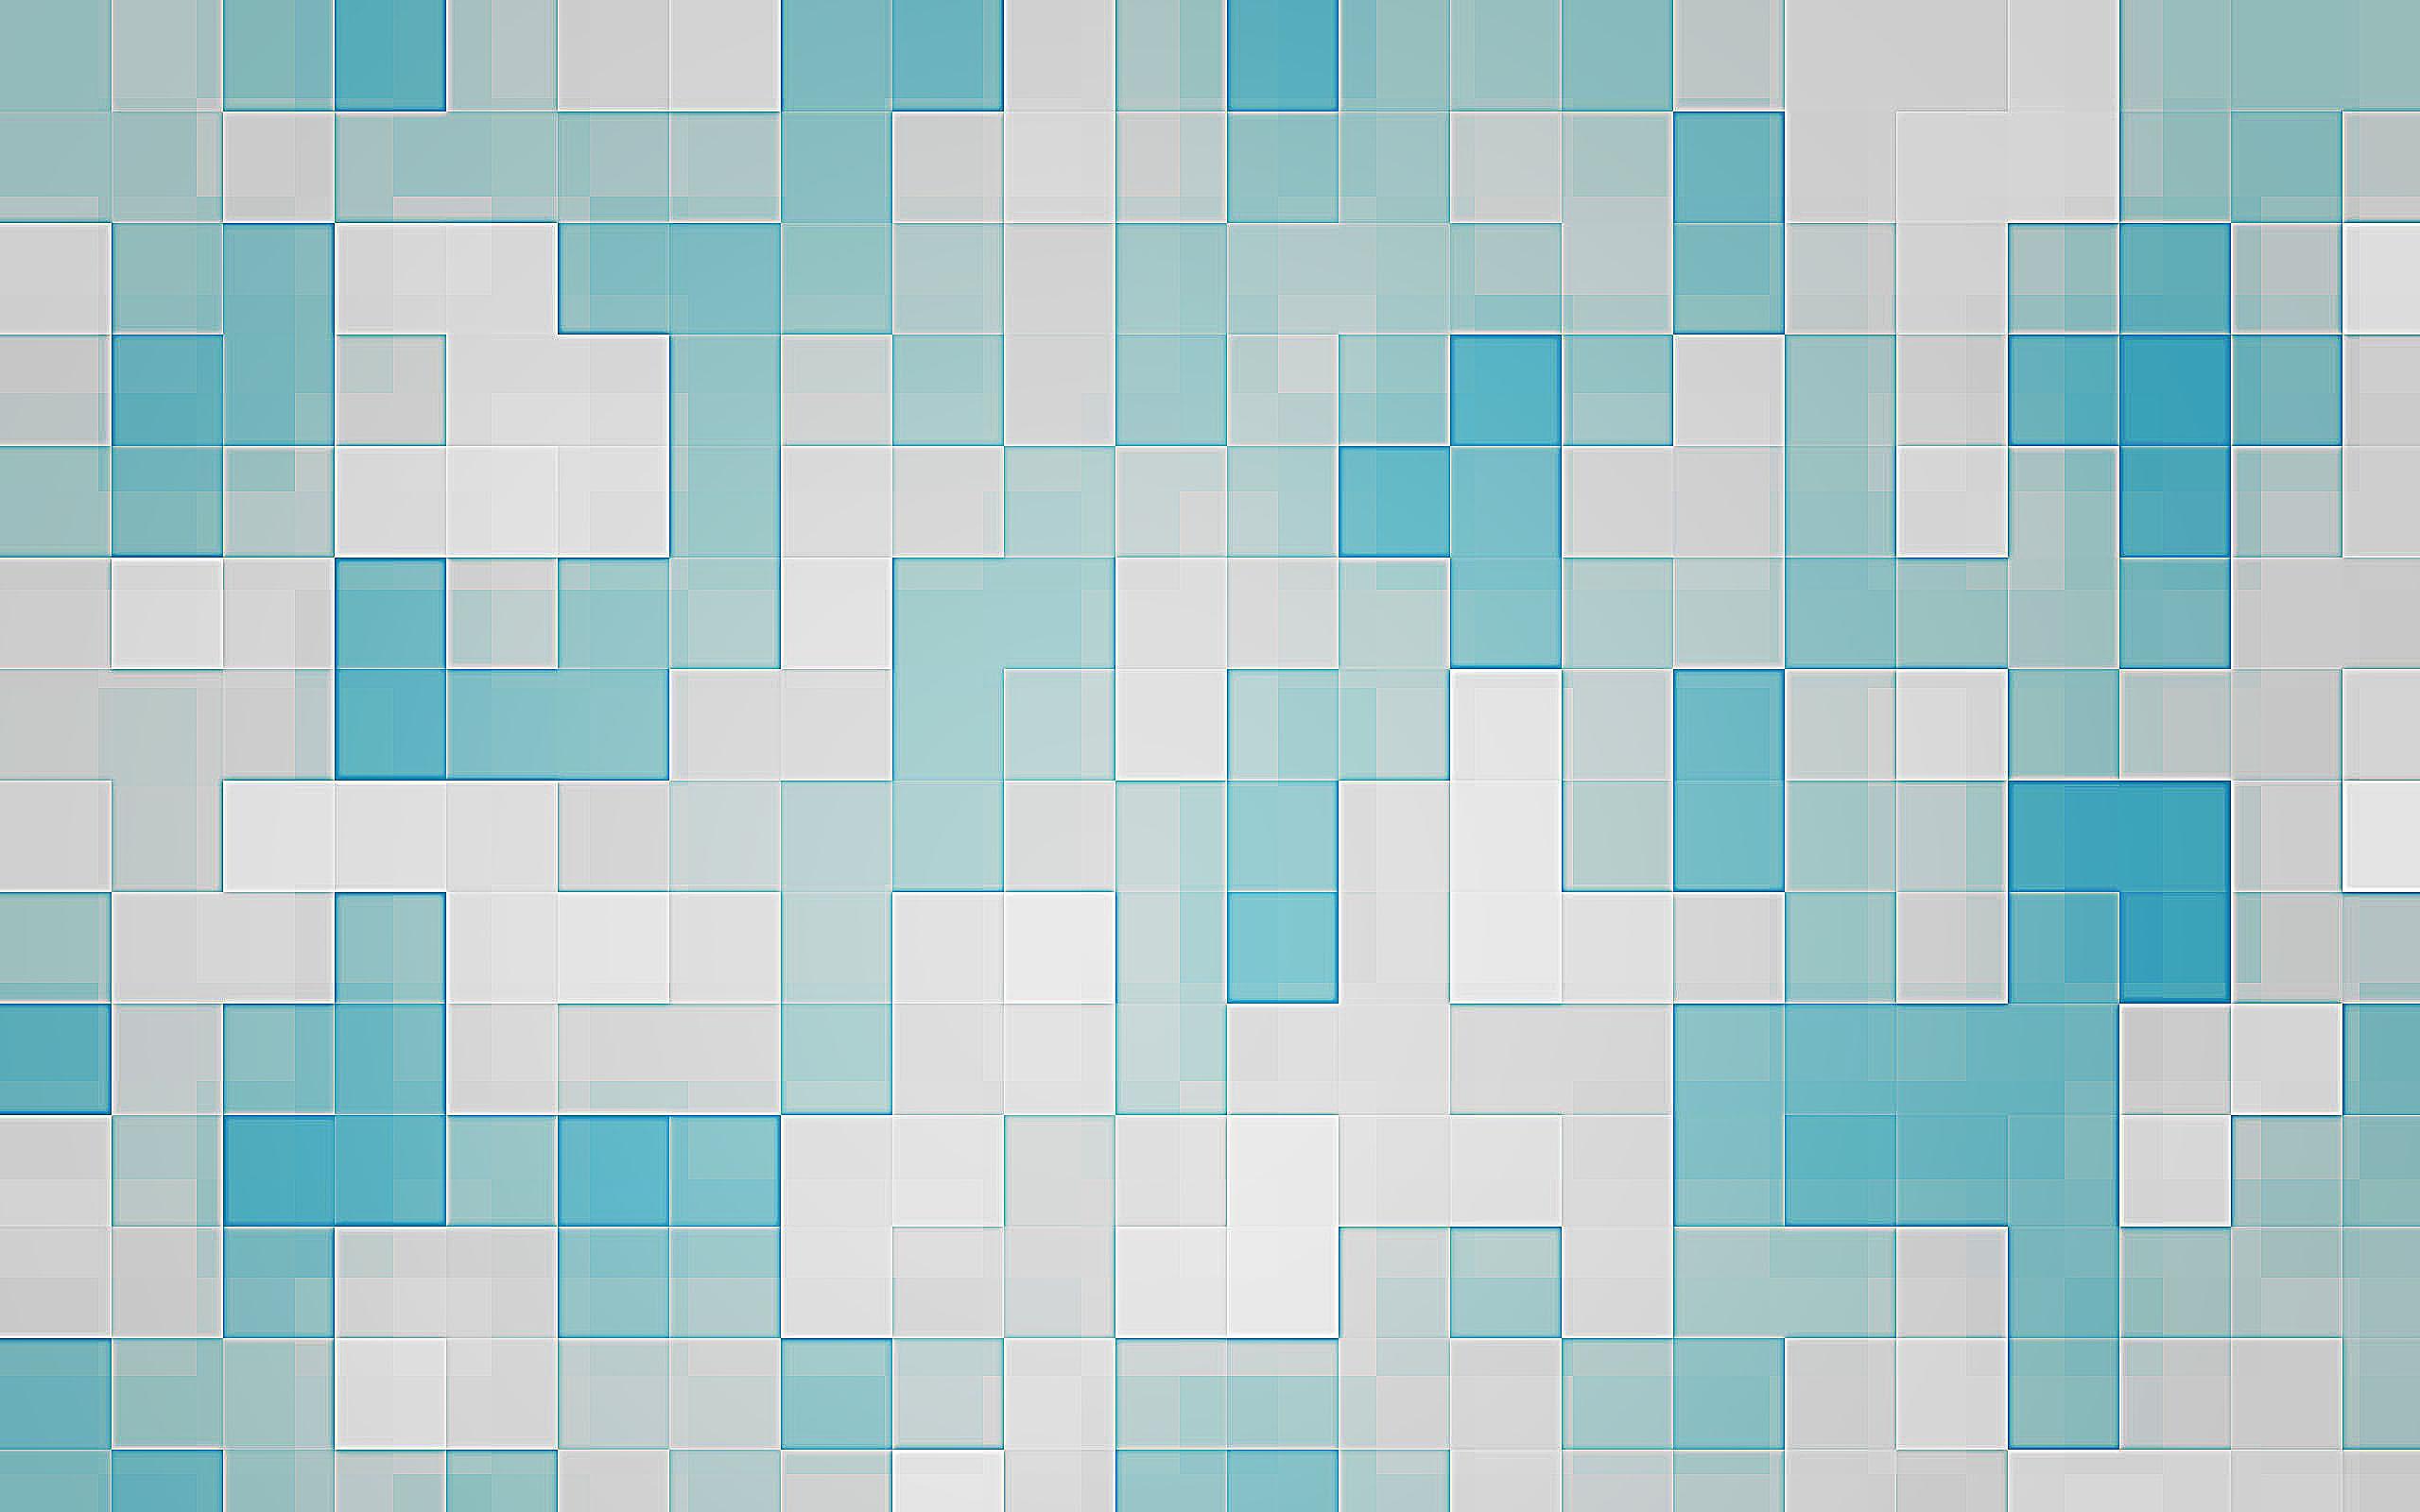 Free Cube Wallpaper 34928 2560x1600 px